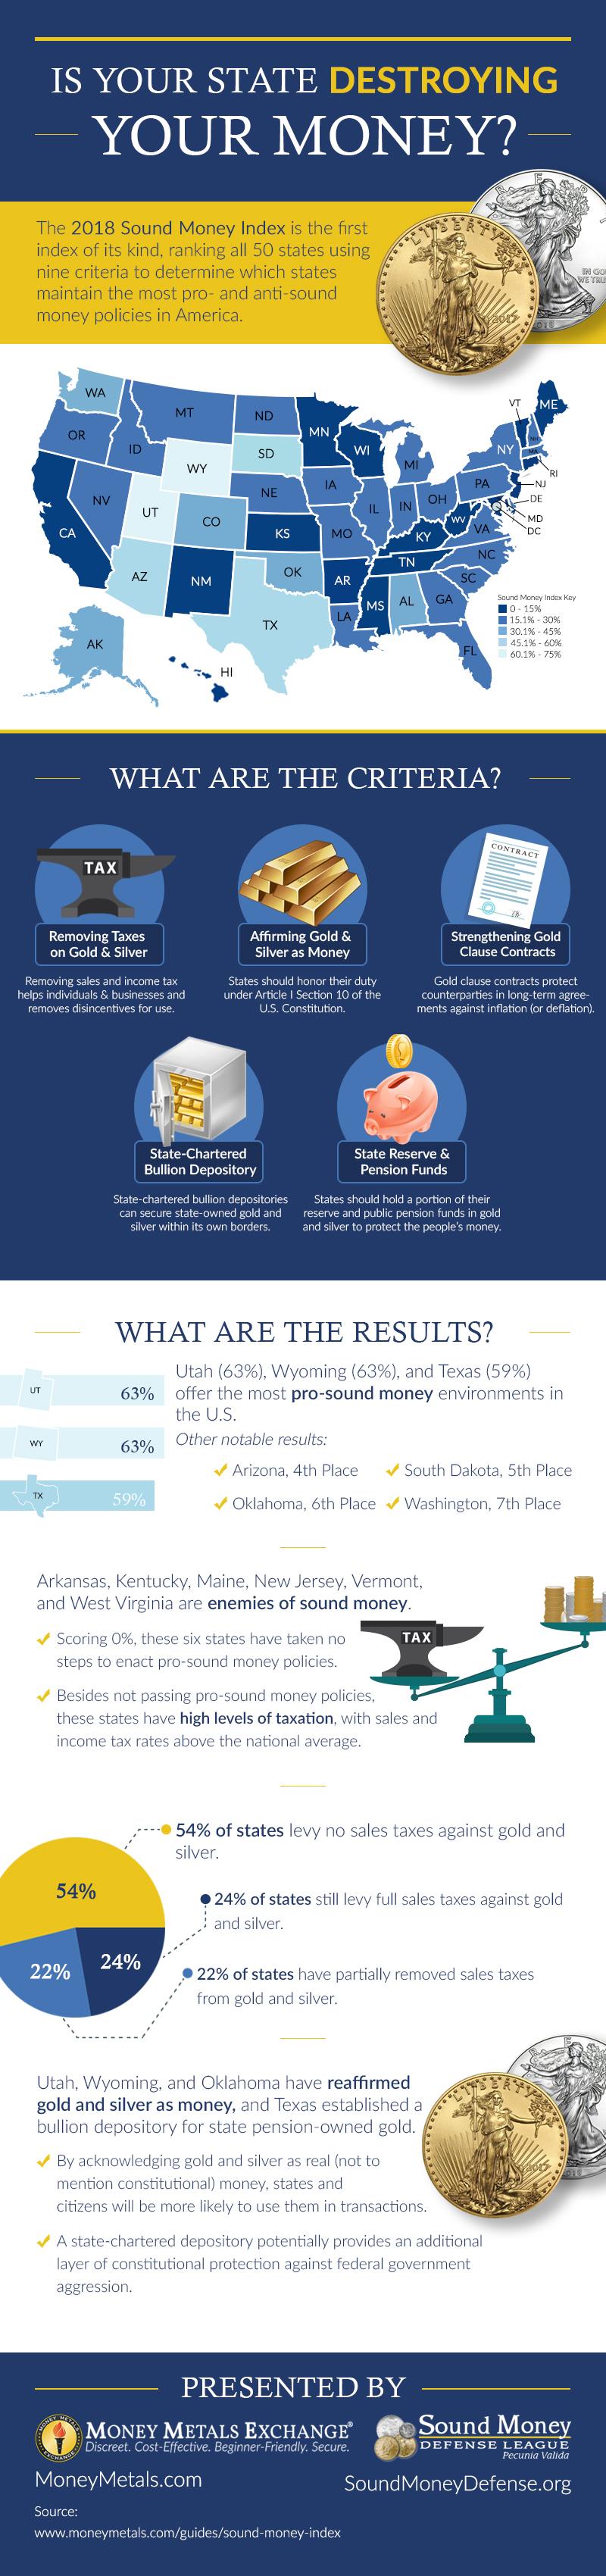 Sound Money Index Infographic